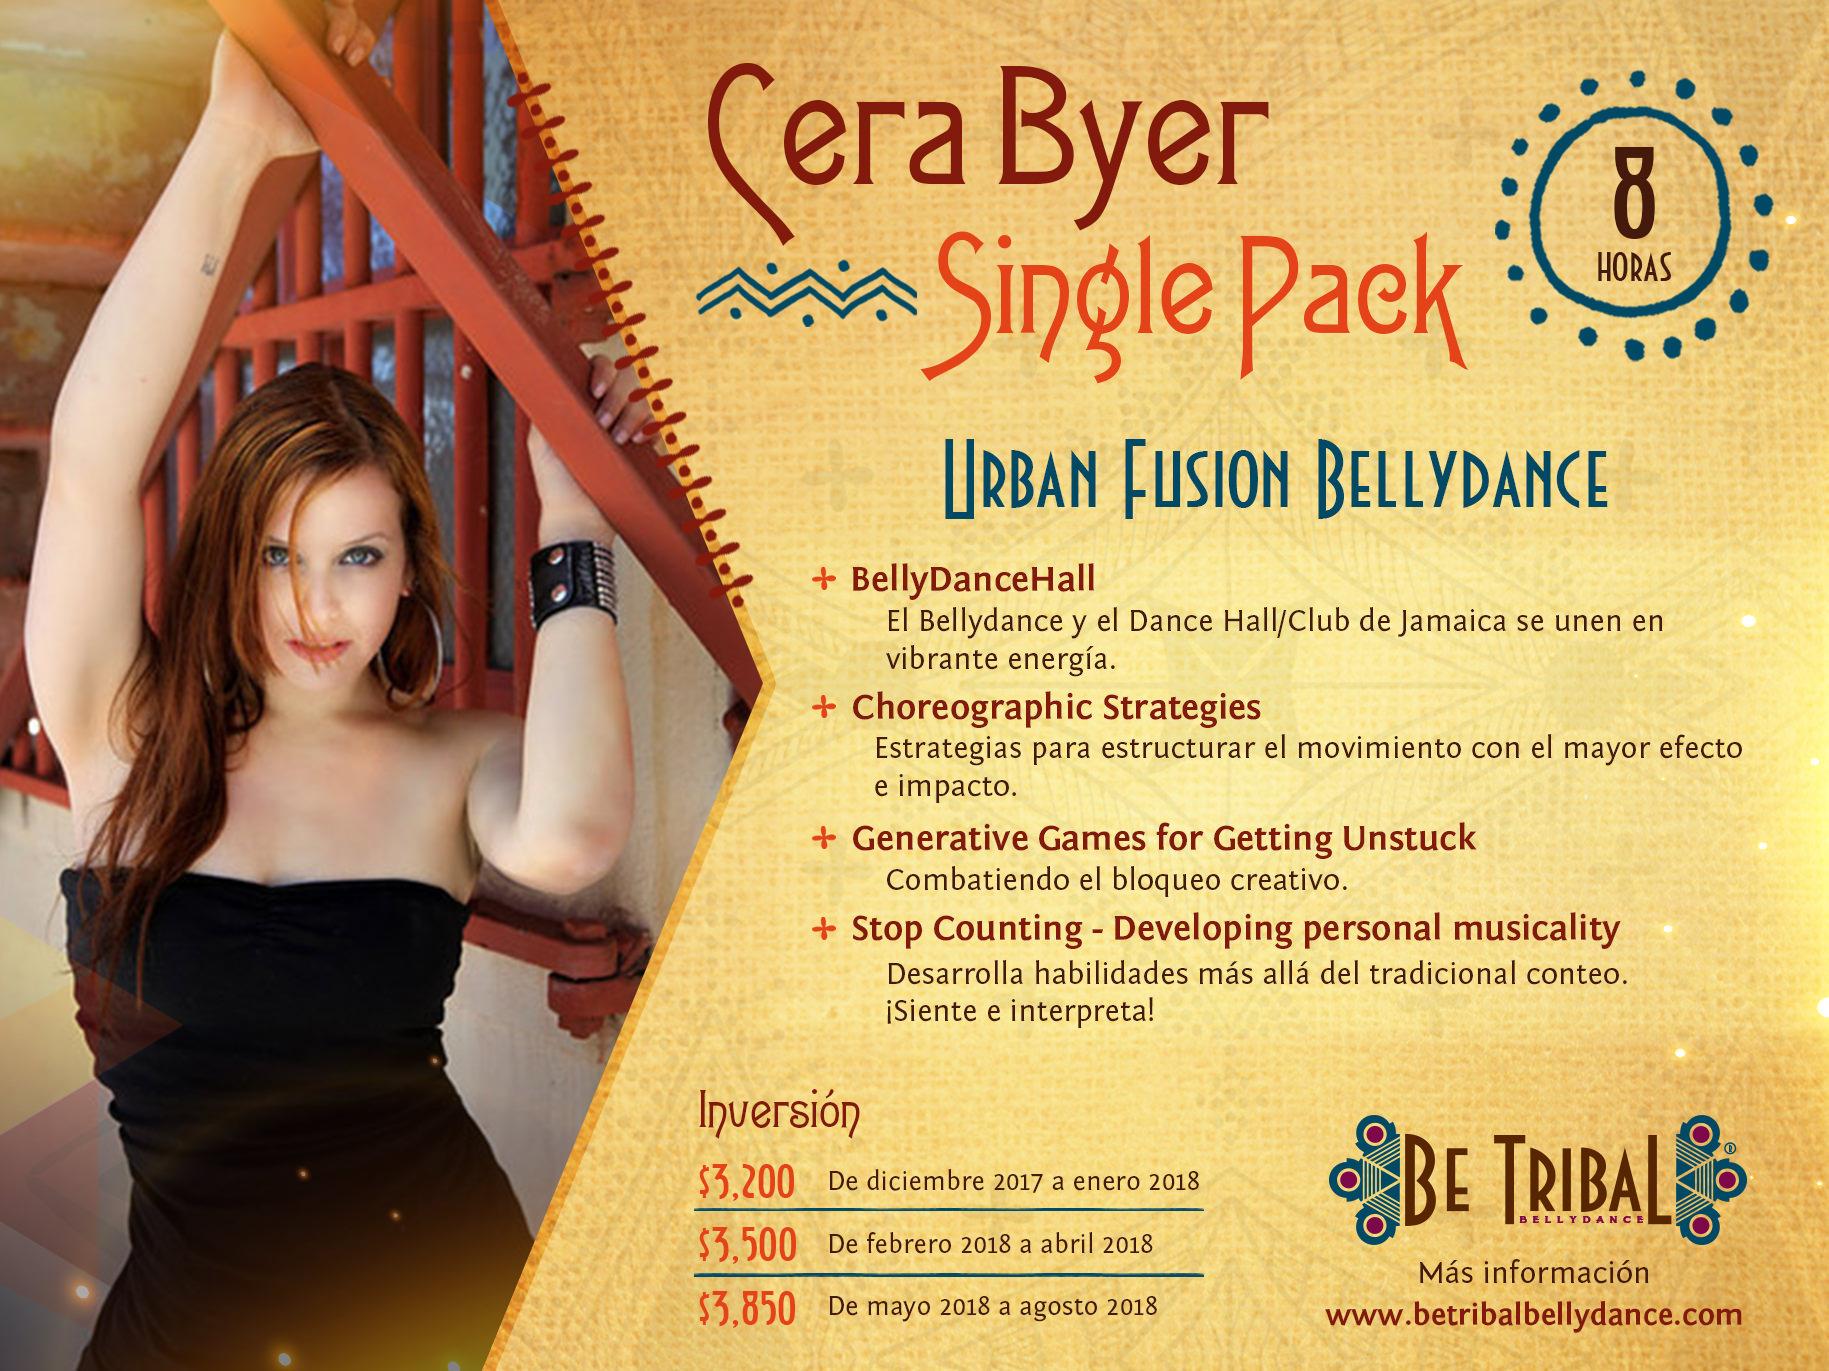 Paquete C Cera Byer Single Pack